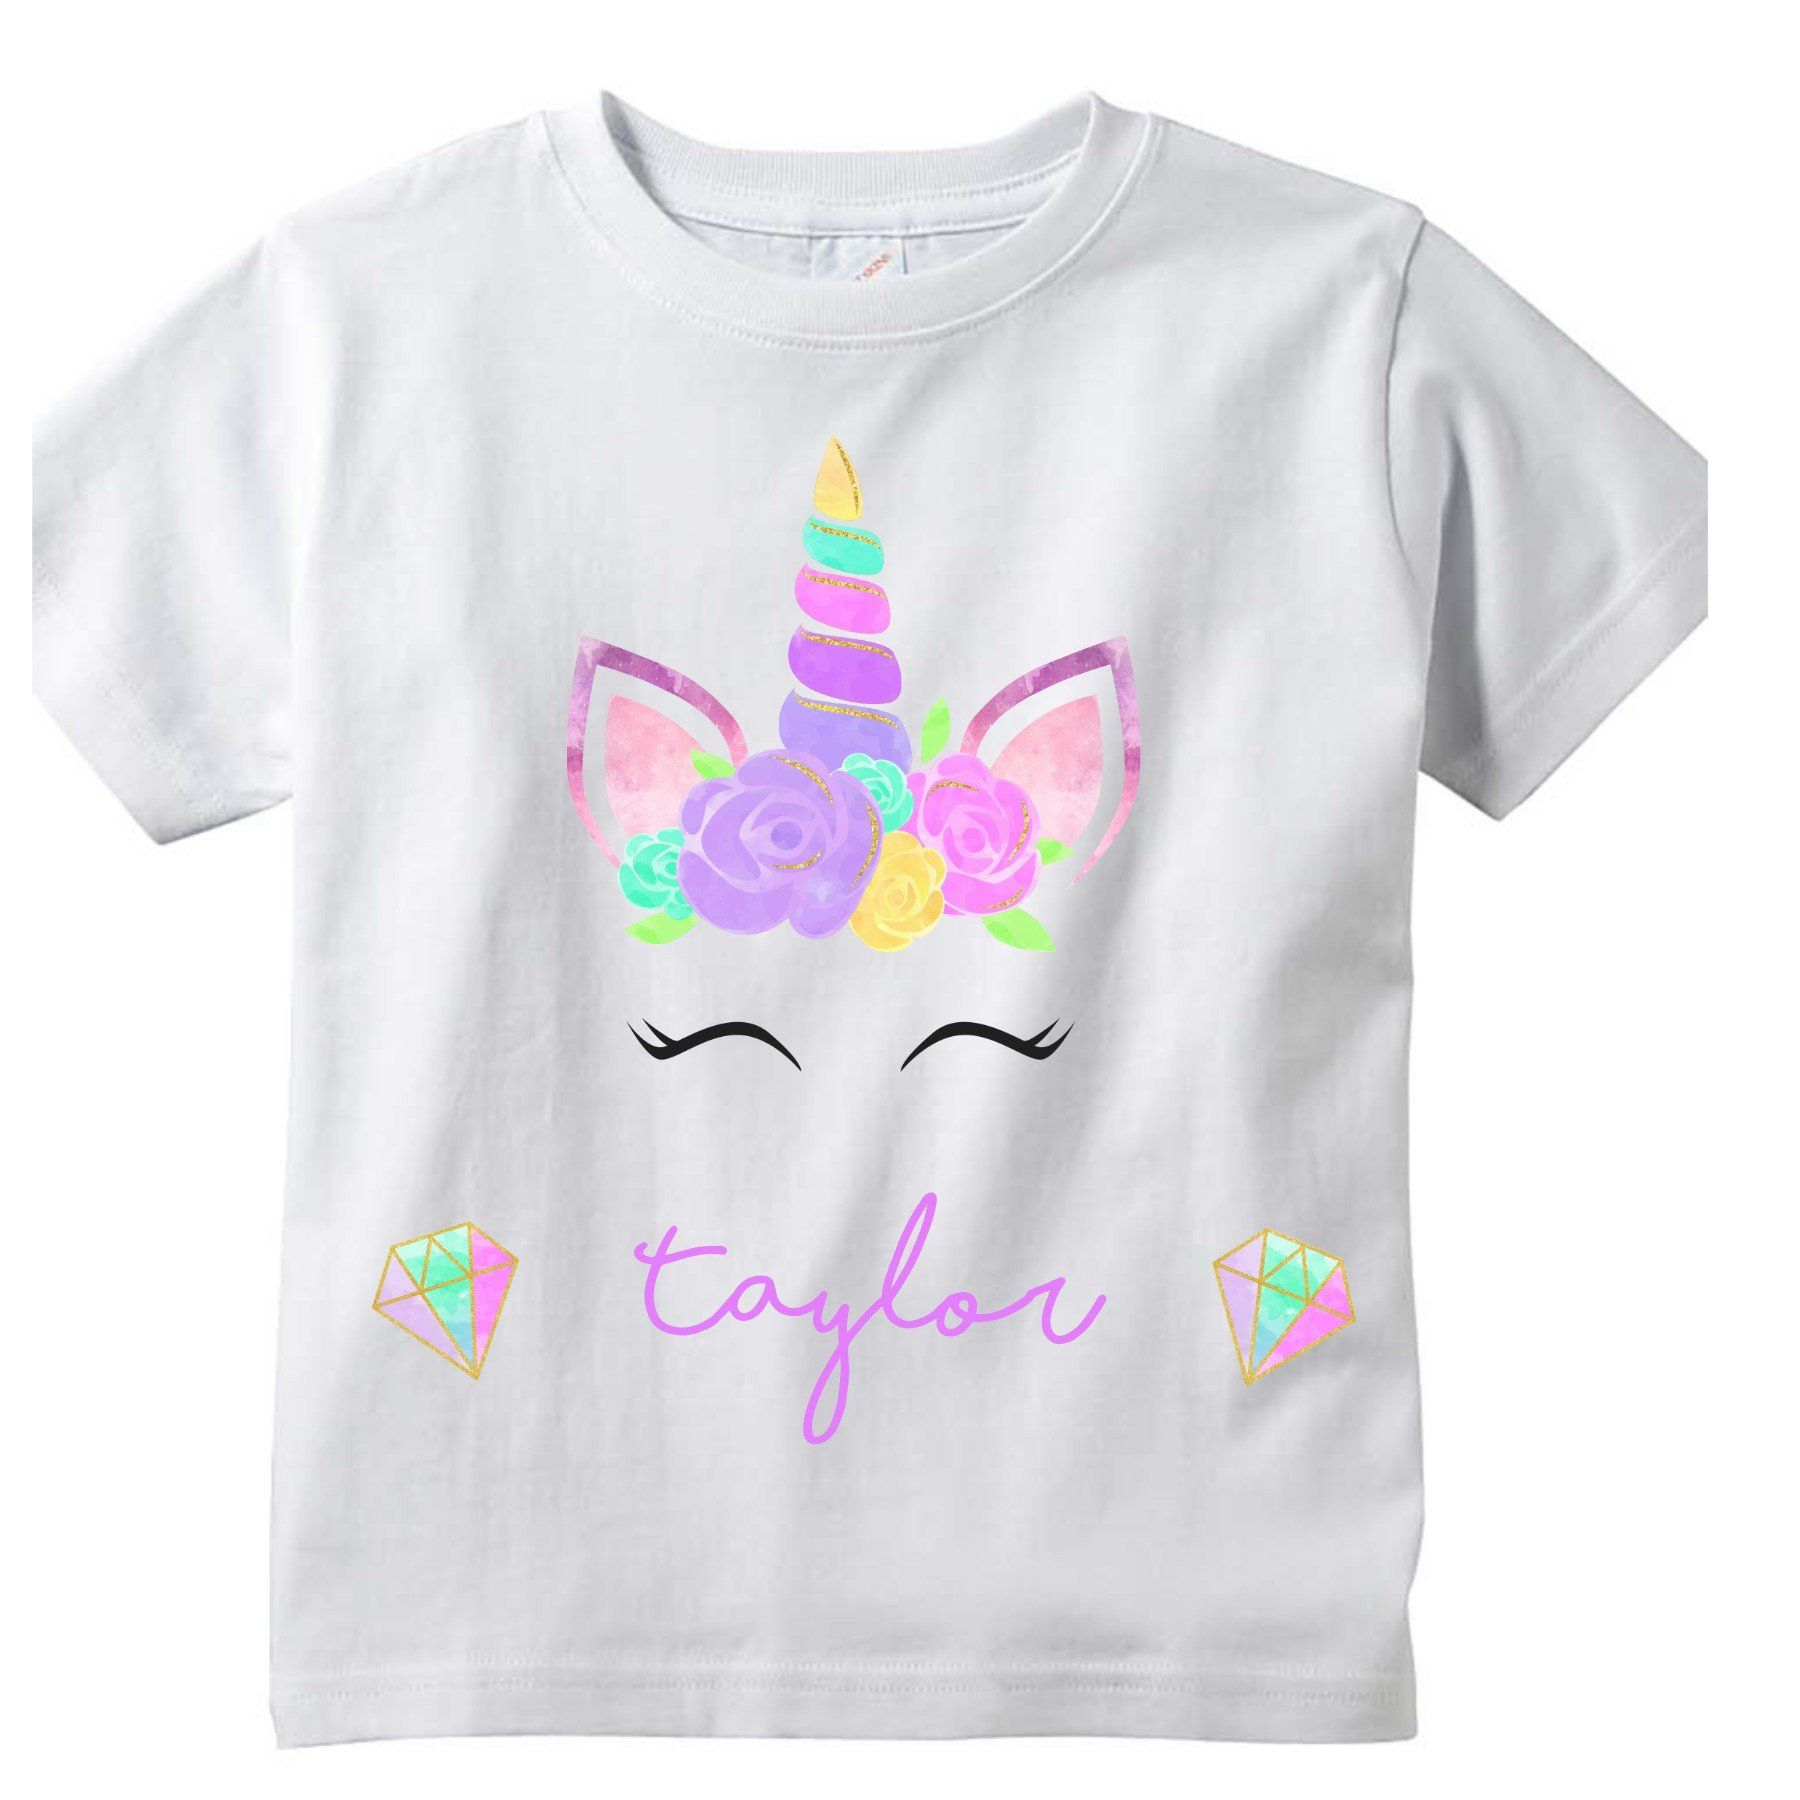 f25f4b00 Custom unicorn girls shirt, back to school unicorn t-shirt, youth unicorn  shirt, girls unicorn tee, girls Birthday Unicorn by CustomCutiesByMimi on  Etsy